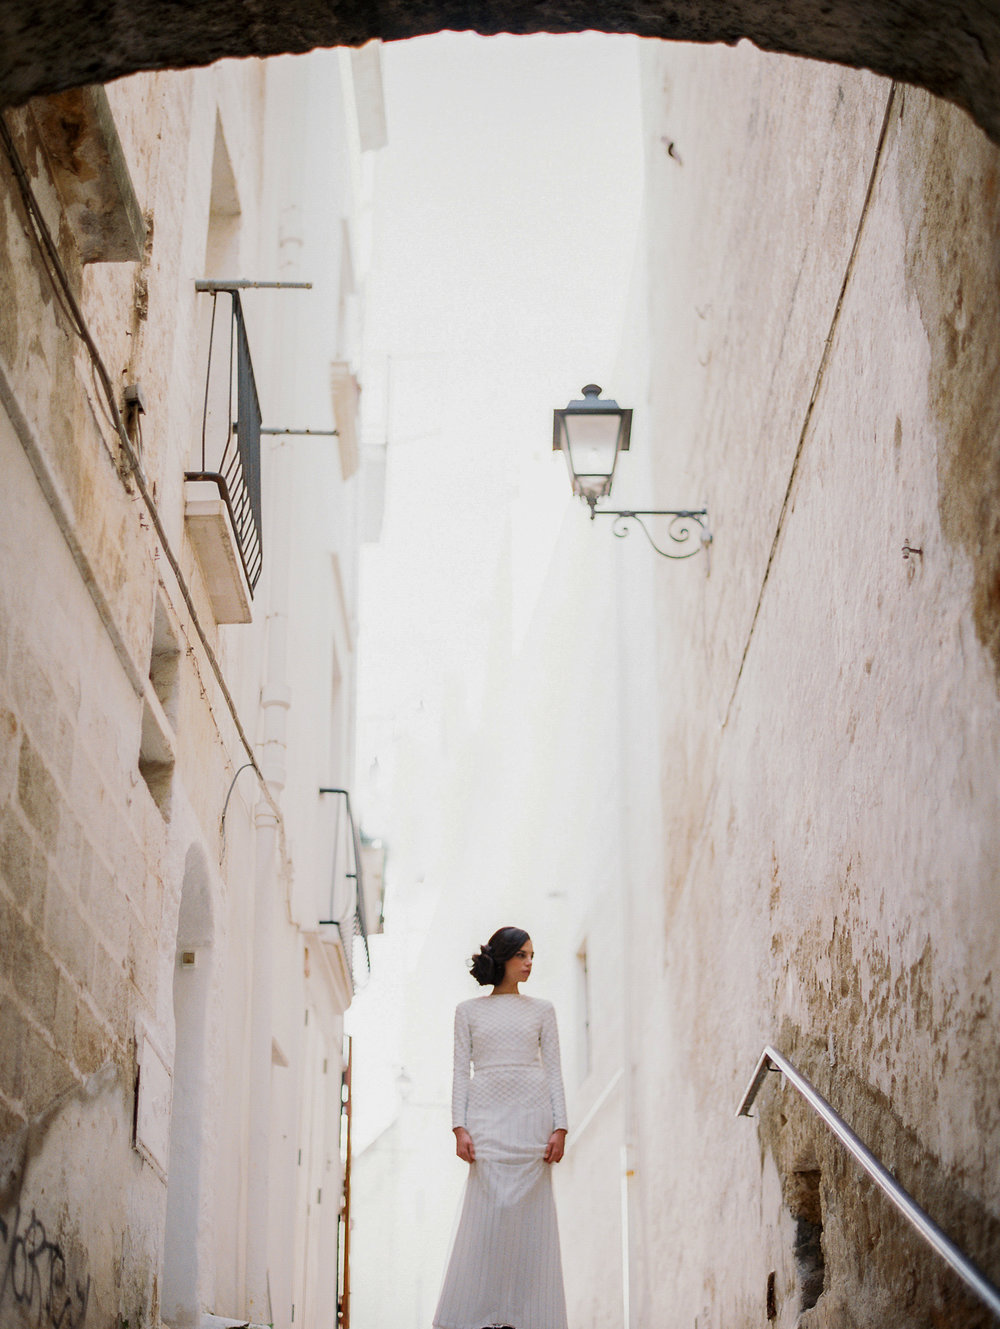 lauramurray-travel-destinationphotography-creativetravel-artists-filmphotography-unearthingtc-bride-walls-europe.jpg